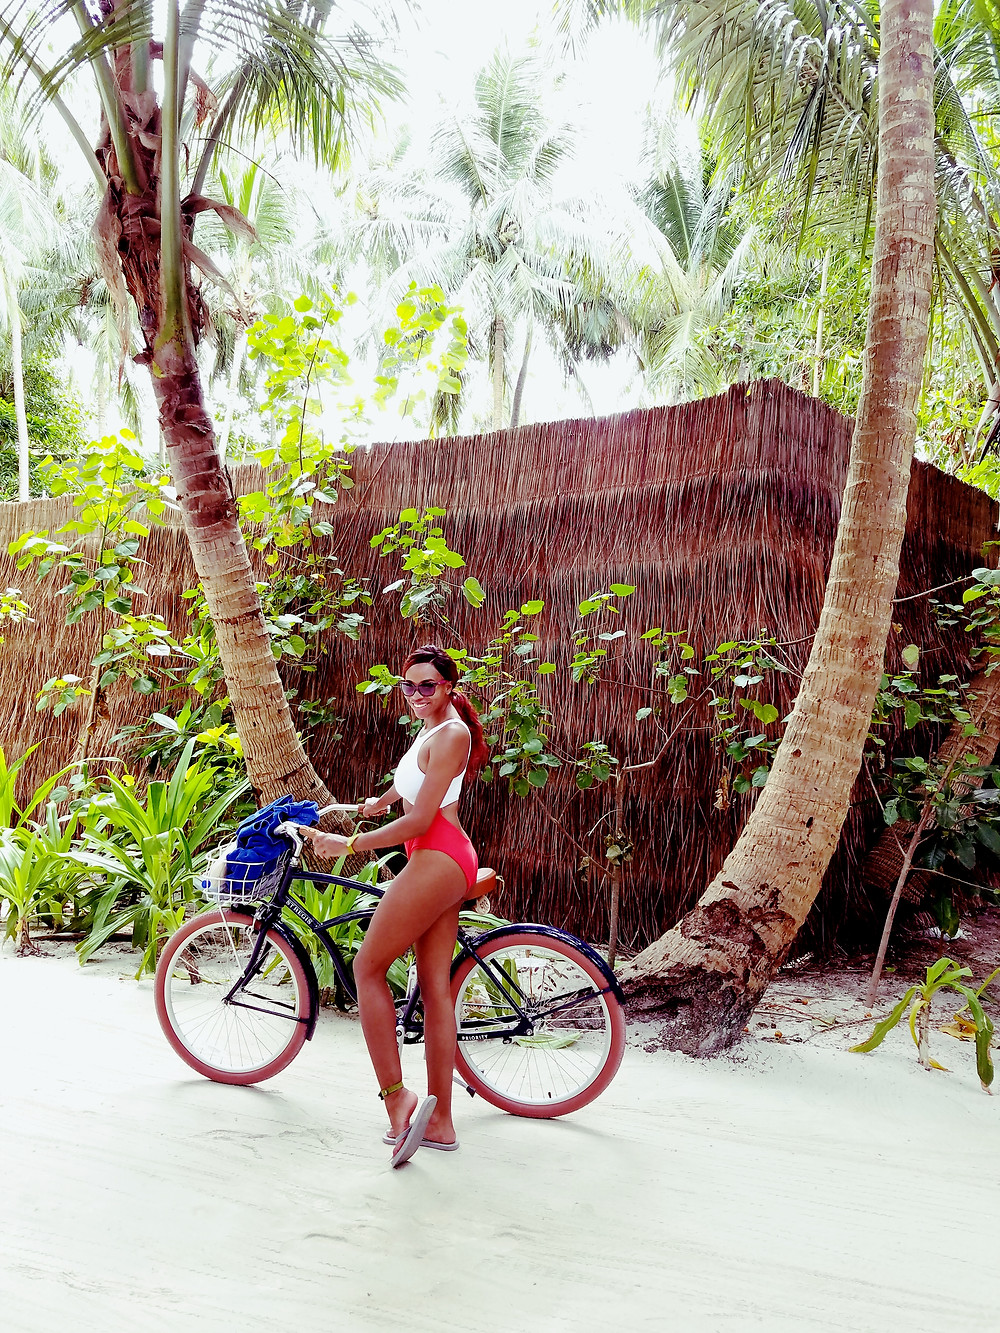 Daily Bike Rides Around The Property